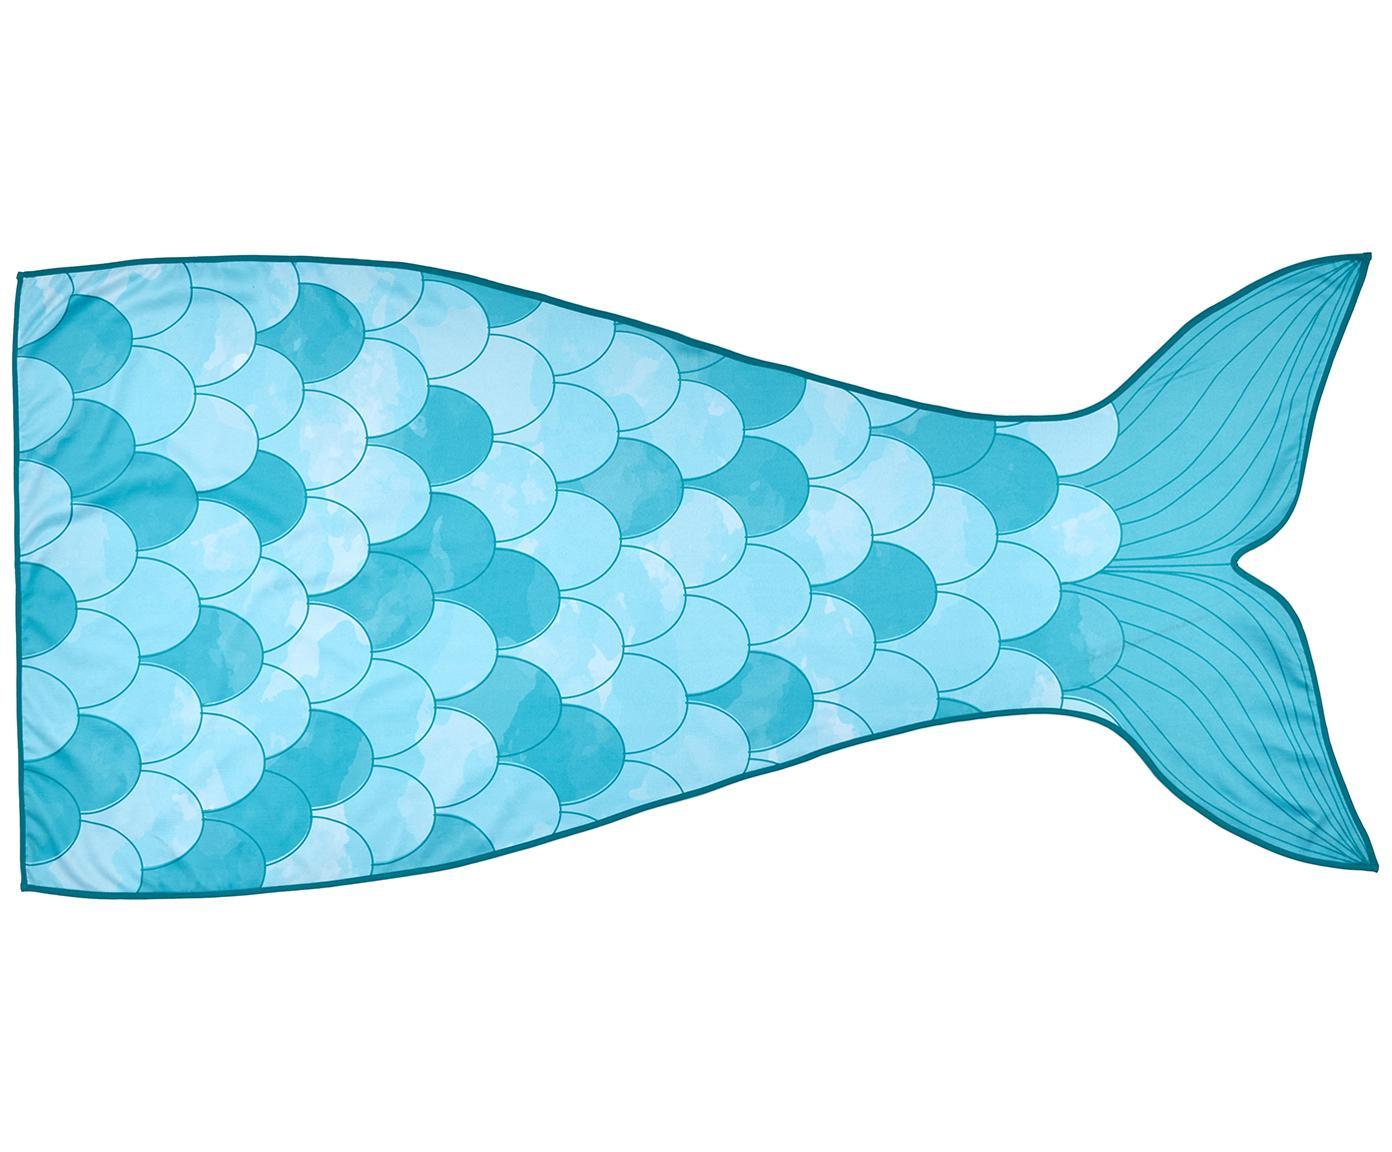 Toalla de playa Mermaid, 55%poliéster, 45%algodón Gramaje ligero 340g/m², Azul claro, turquesa, blanco, An 87 x L 180 cm